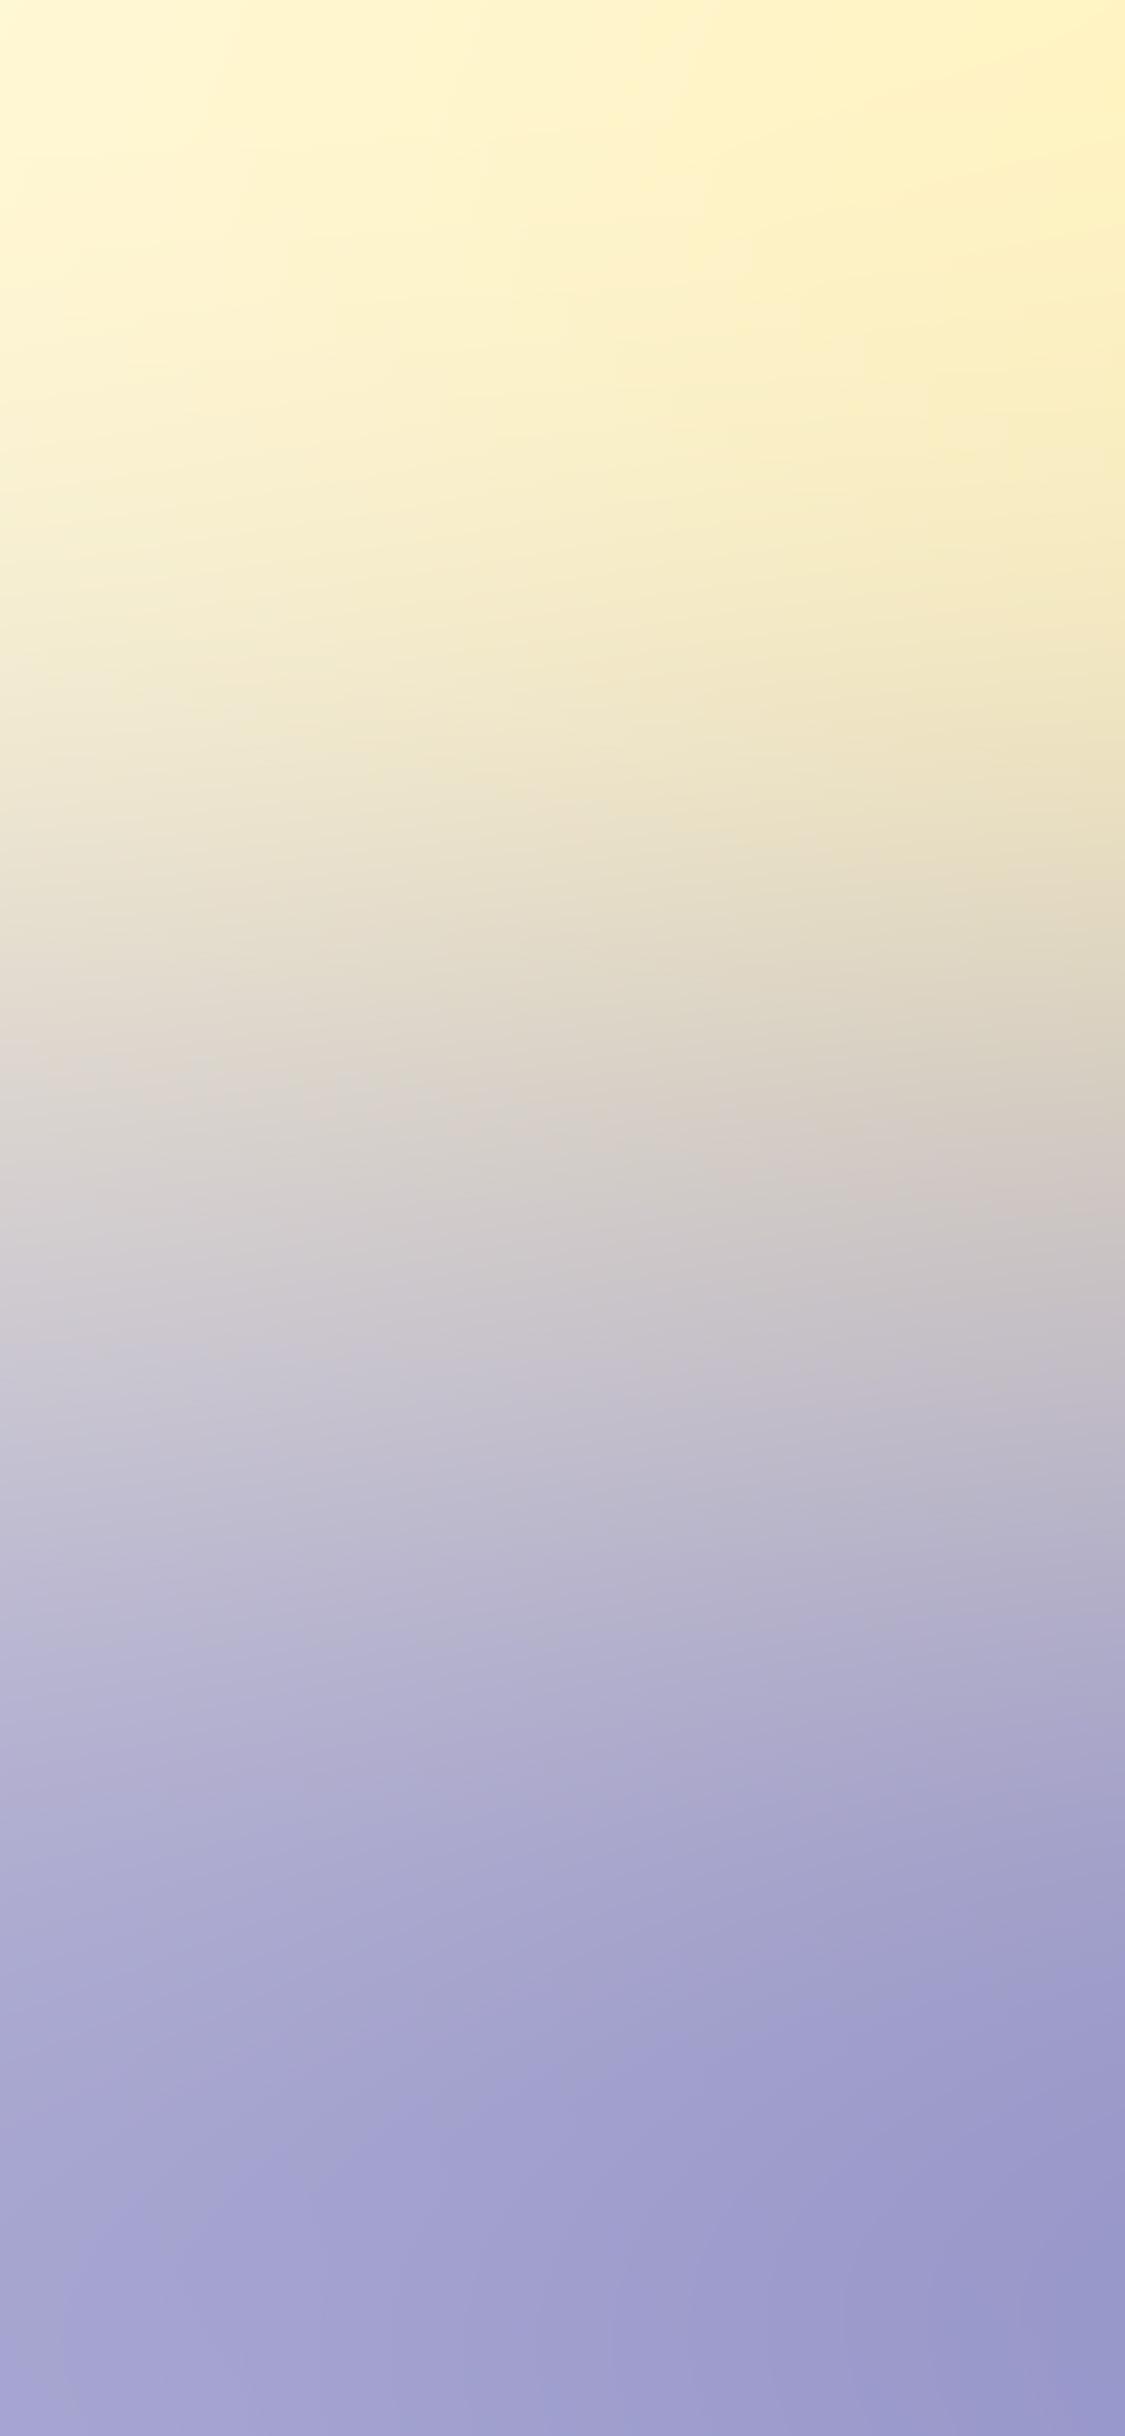 iPhonexpapers.com-Apple-iPhone-wallpaper-sm08-purple-blur-gradation-pastel